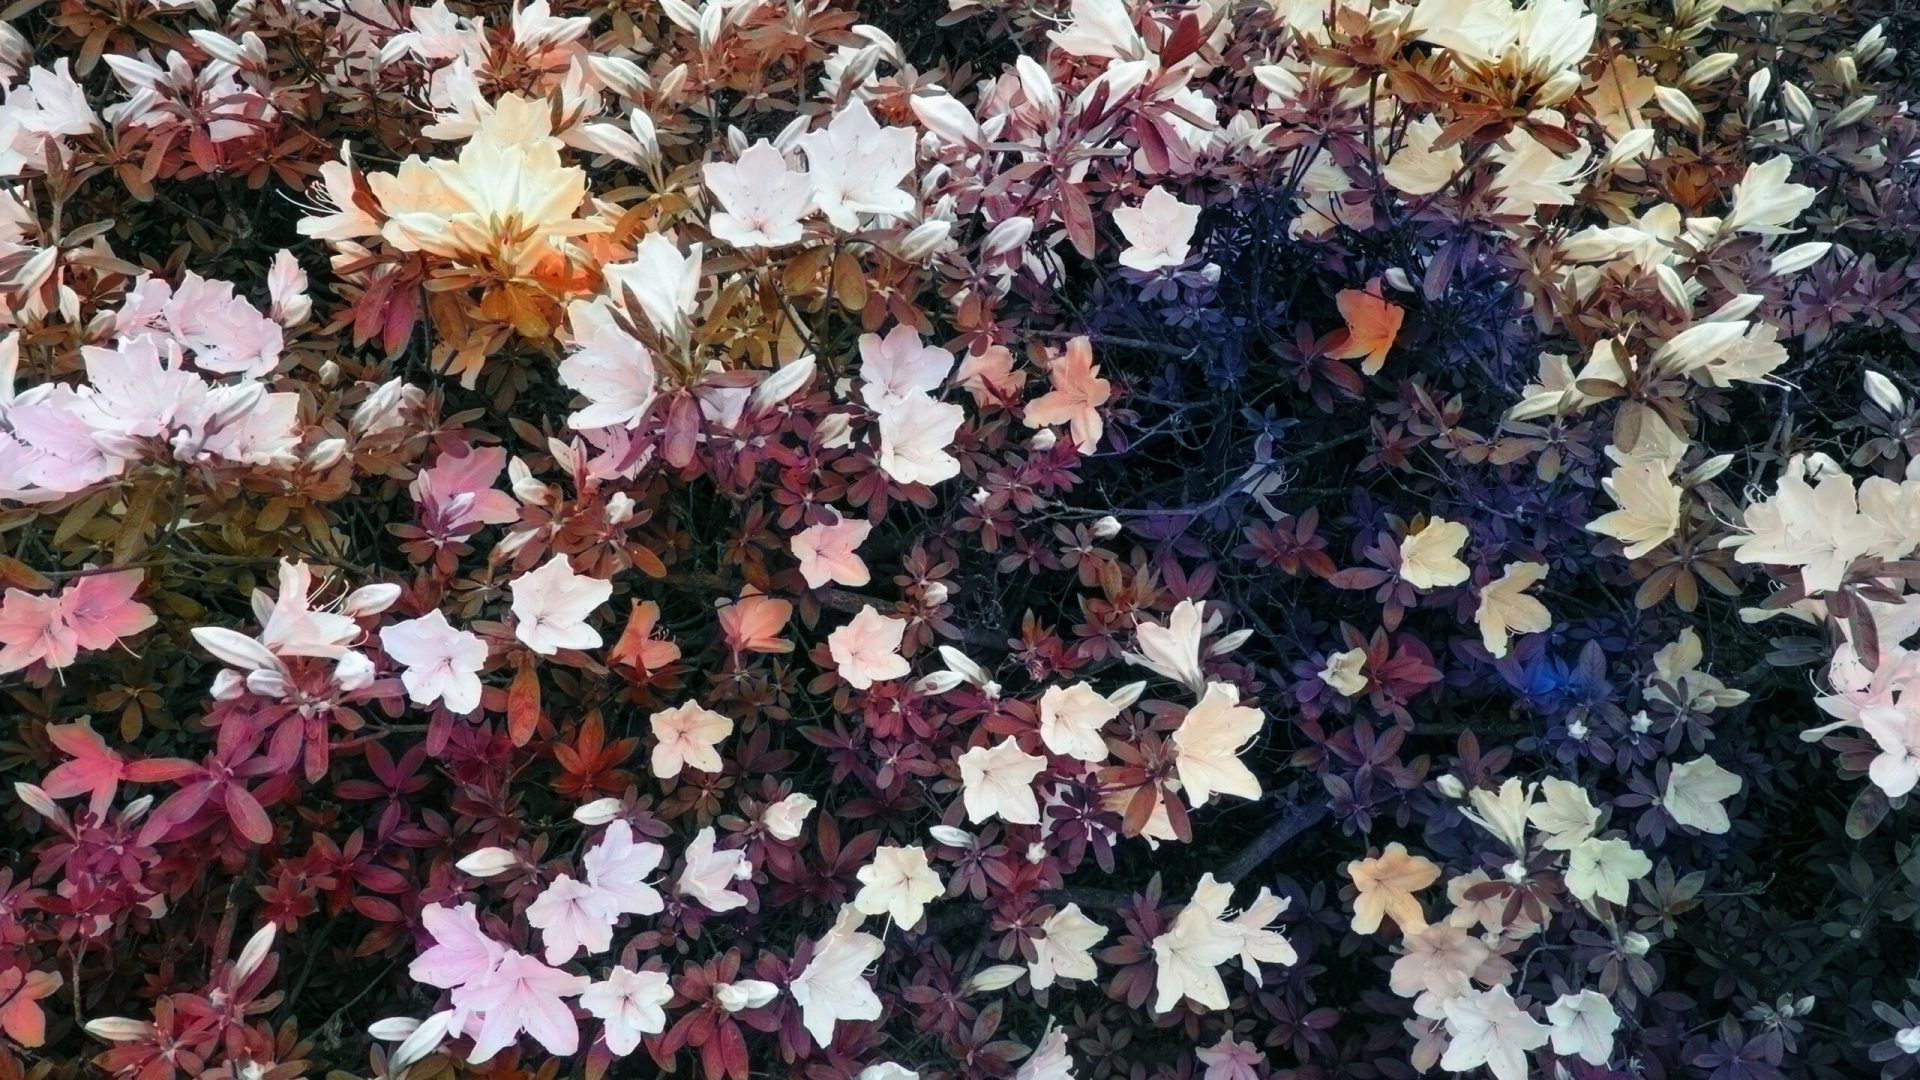 "Trevor Paglen,   Bloom (Coral), 2020,   dye sublimation print,  175.3 cm × 233.7 cm (69"" × 92""),   Edition 1 of 3,  Edition of 3 + 1 AP,   PHOTO,   No. 75673.01,  Alt # 384,   format of photography: digital,  source of photography: Trevor Paglen Studio"